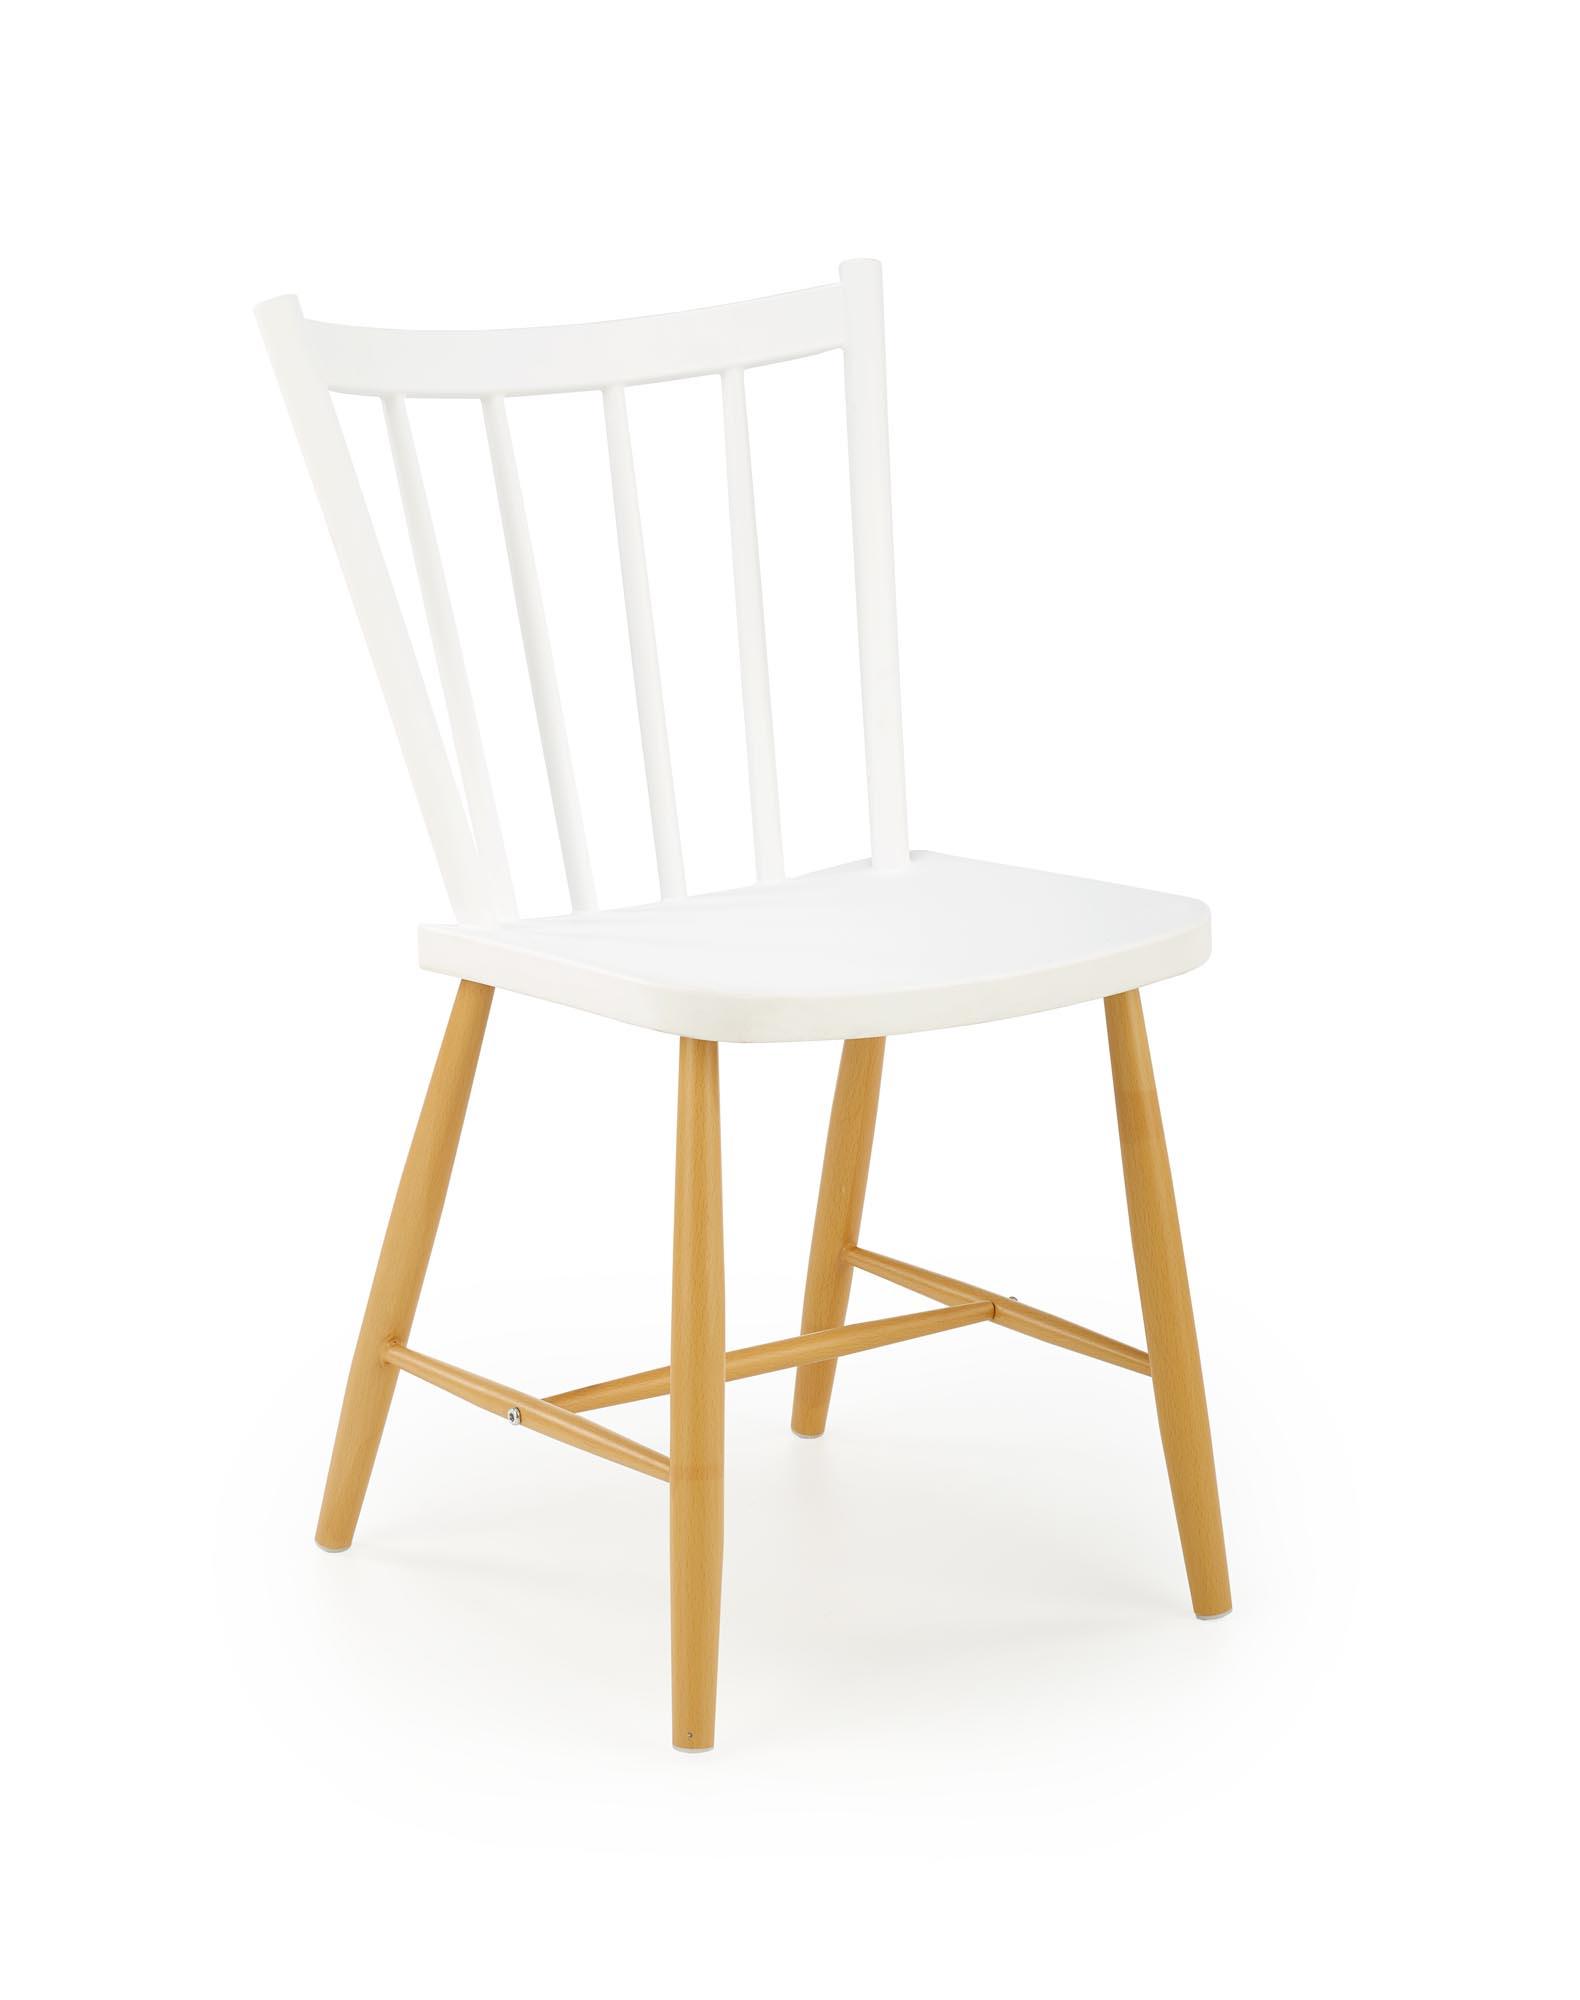 K419 krzesło, kolor: biały / naturalny